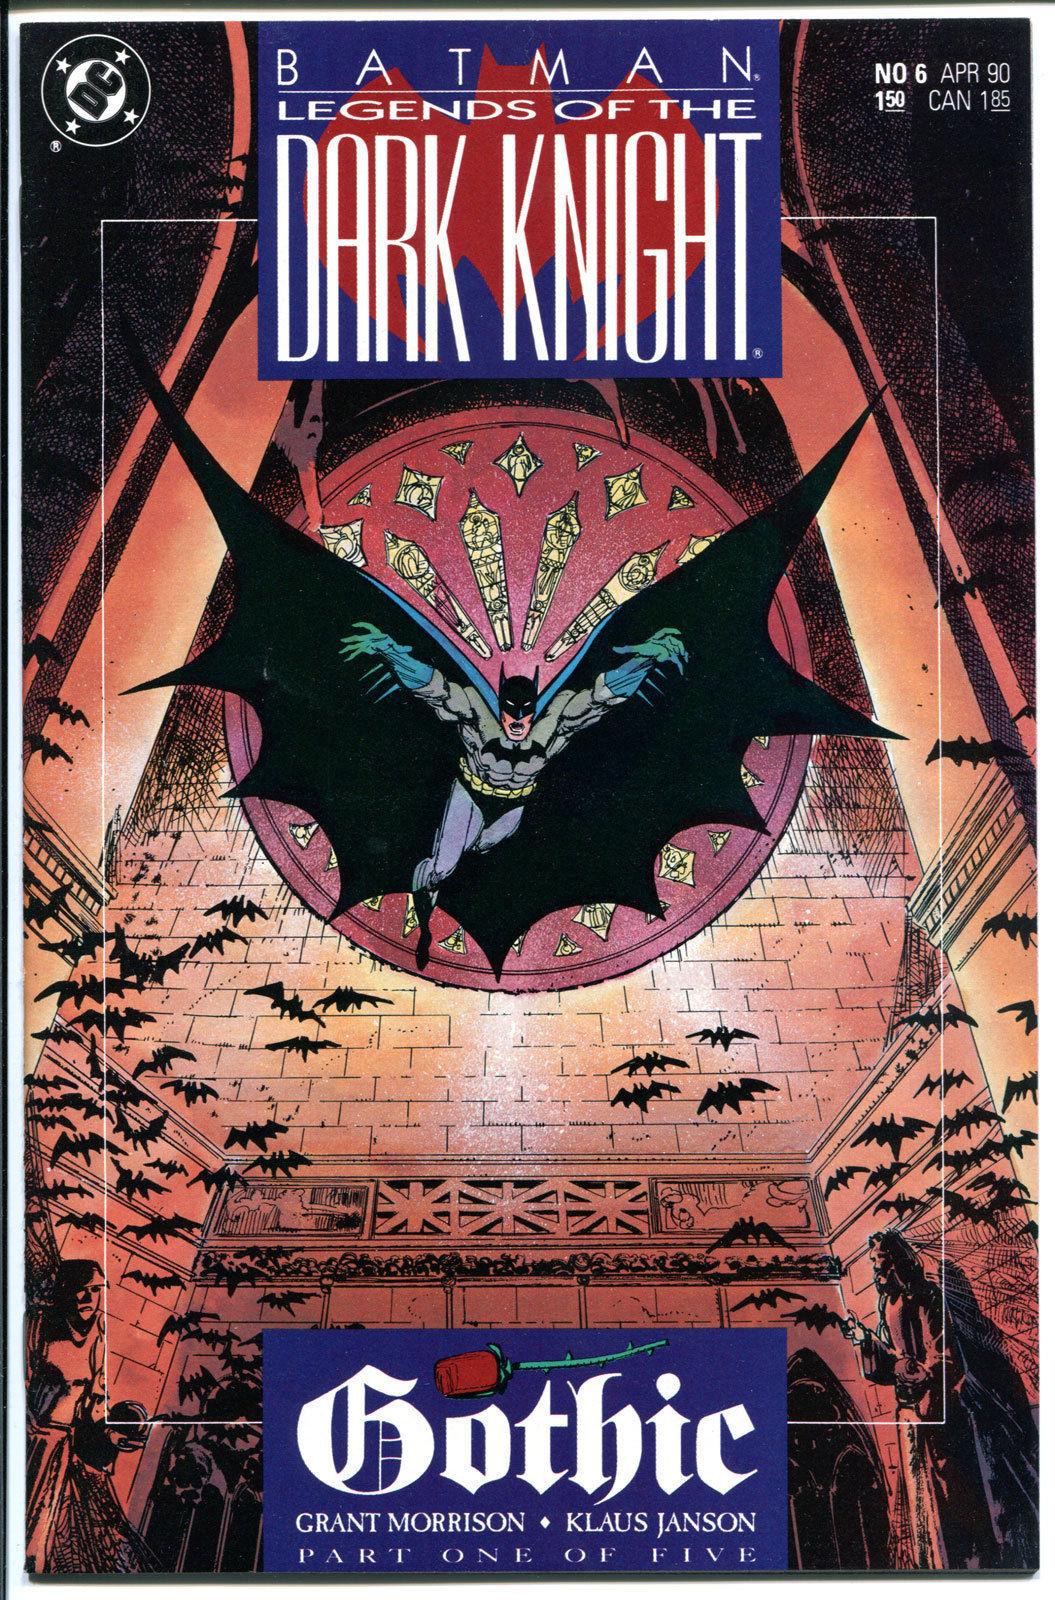 BATMAN: LEGENDS OF THE DARK KNIGHT #6, Gothic, 1989,NM+